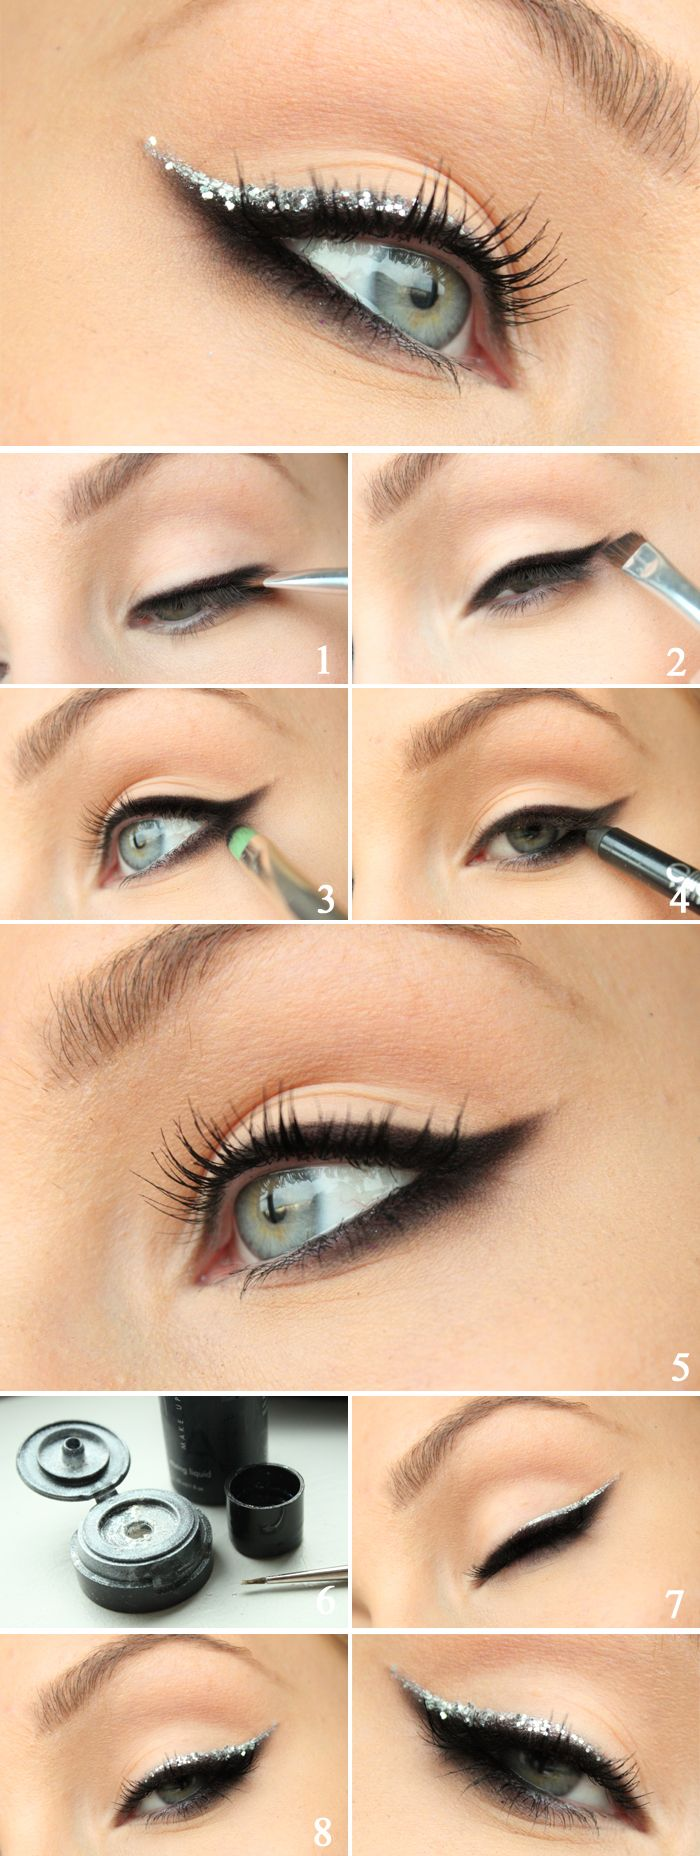 Tutorial – Smokey eyeliner with silver glitter